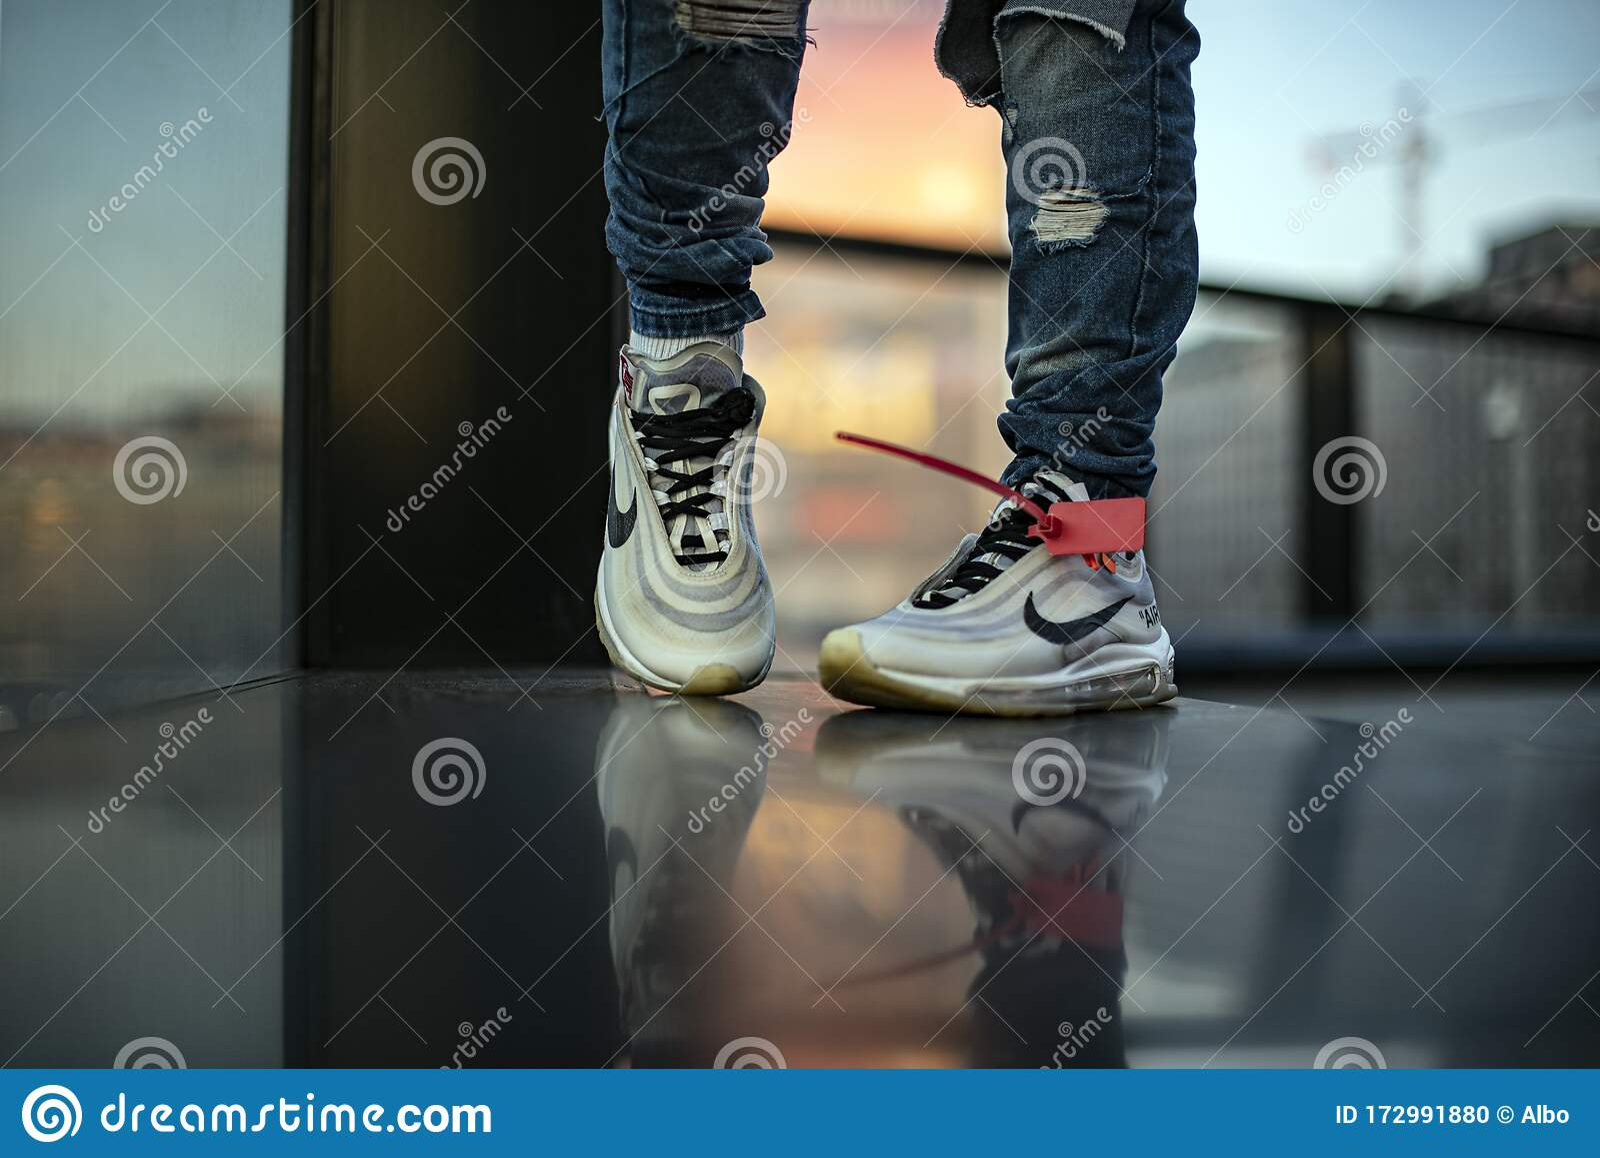 air max 97 white on feet men